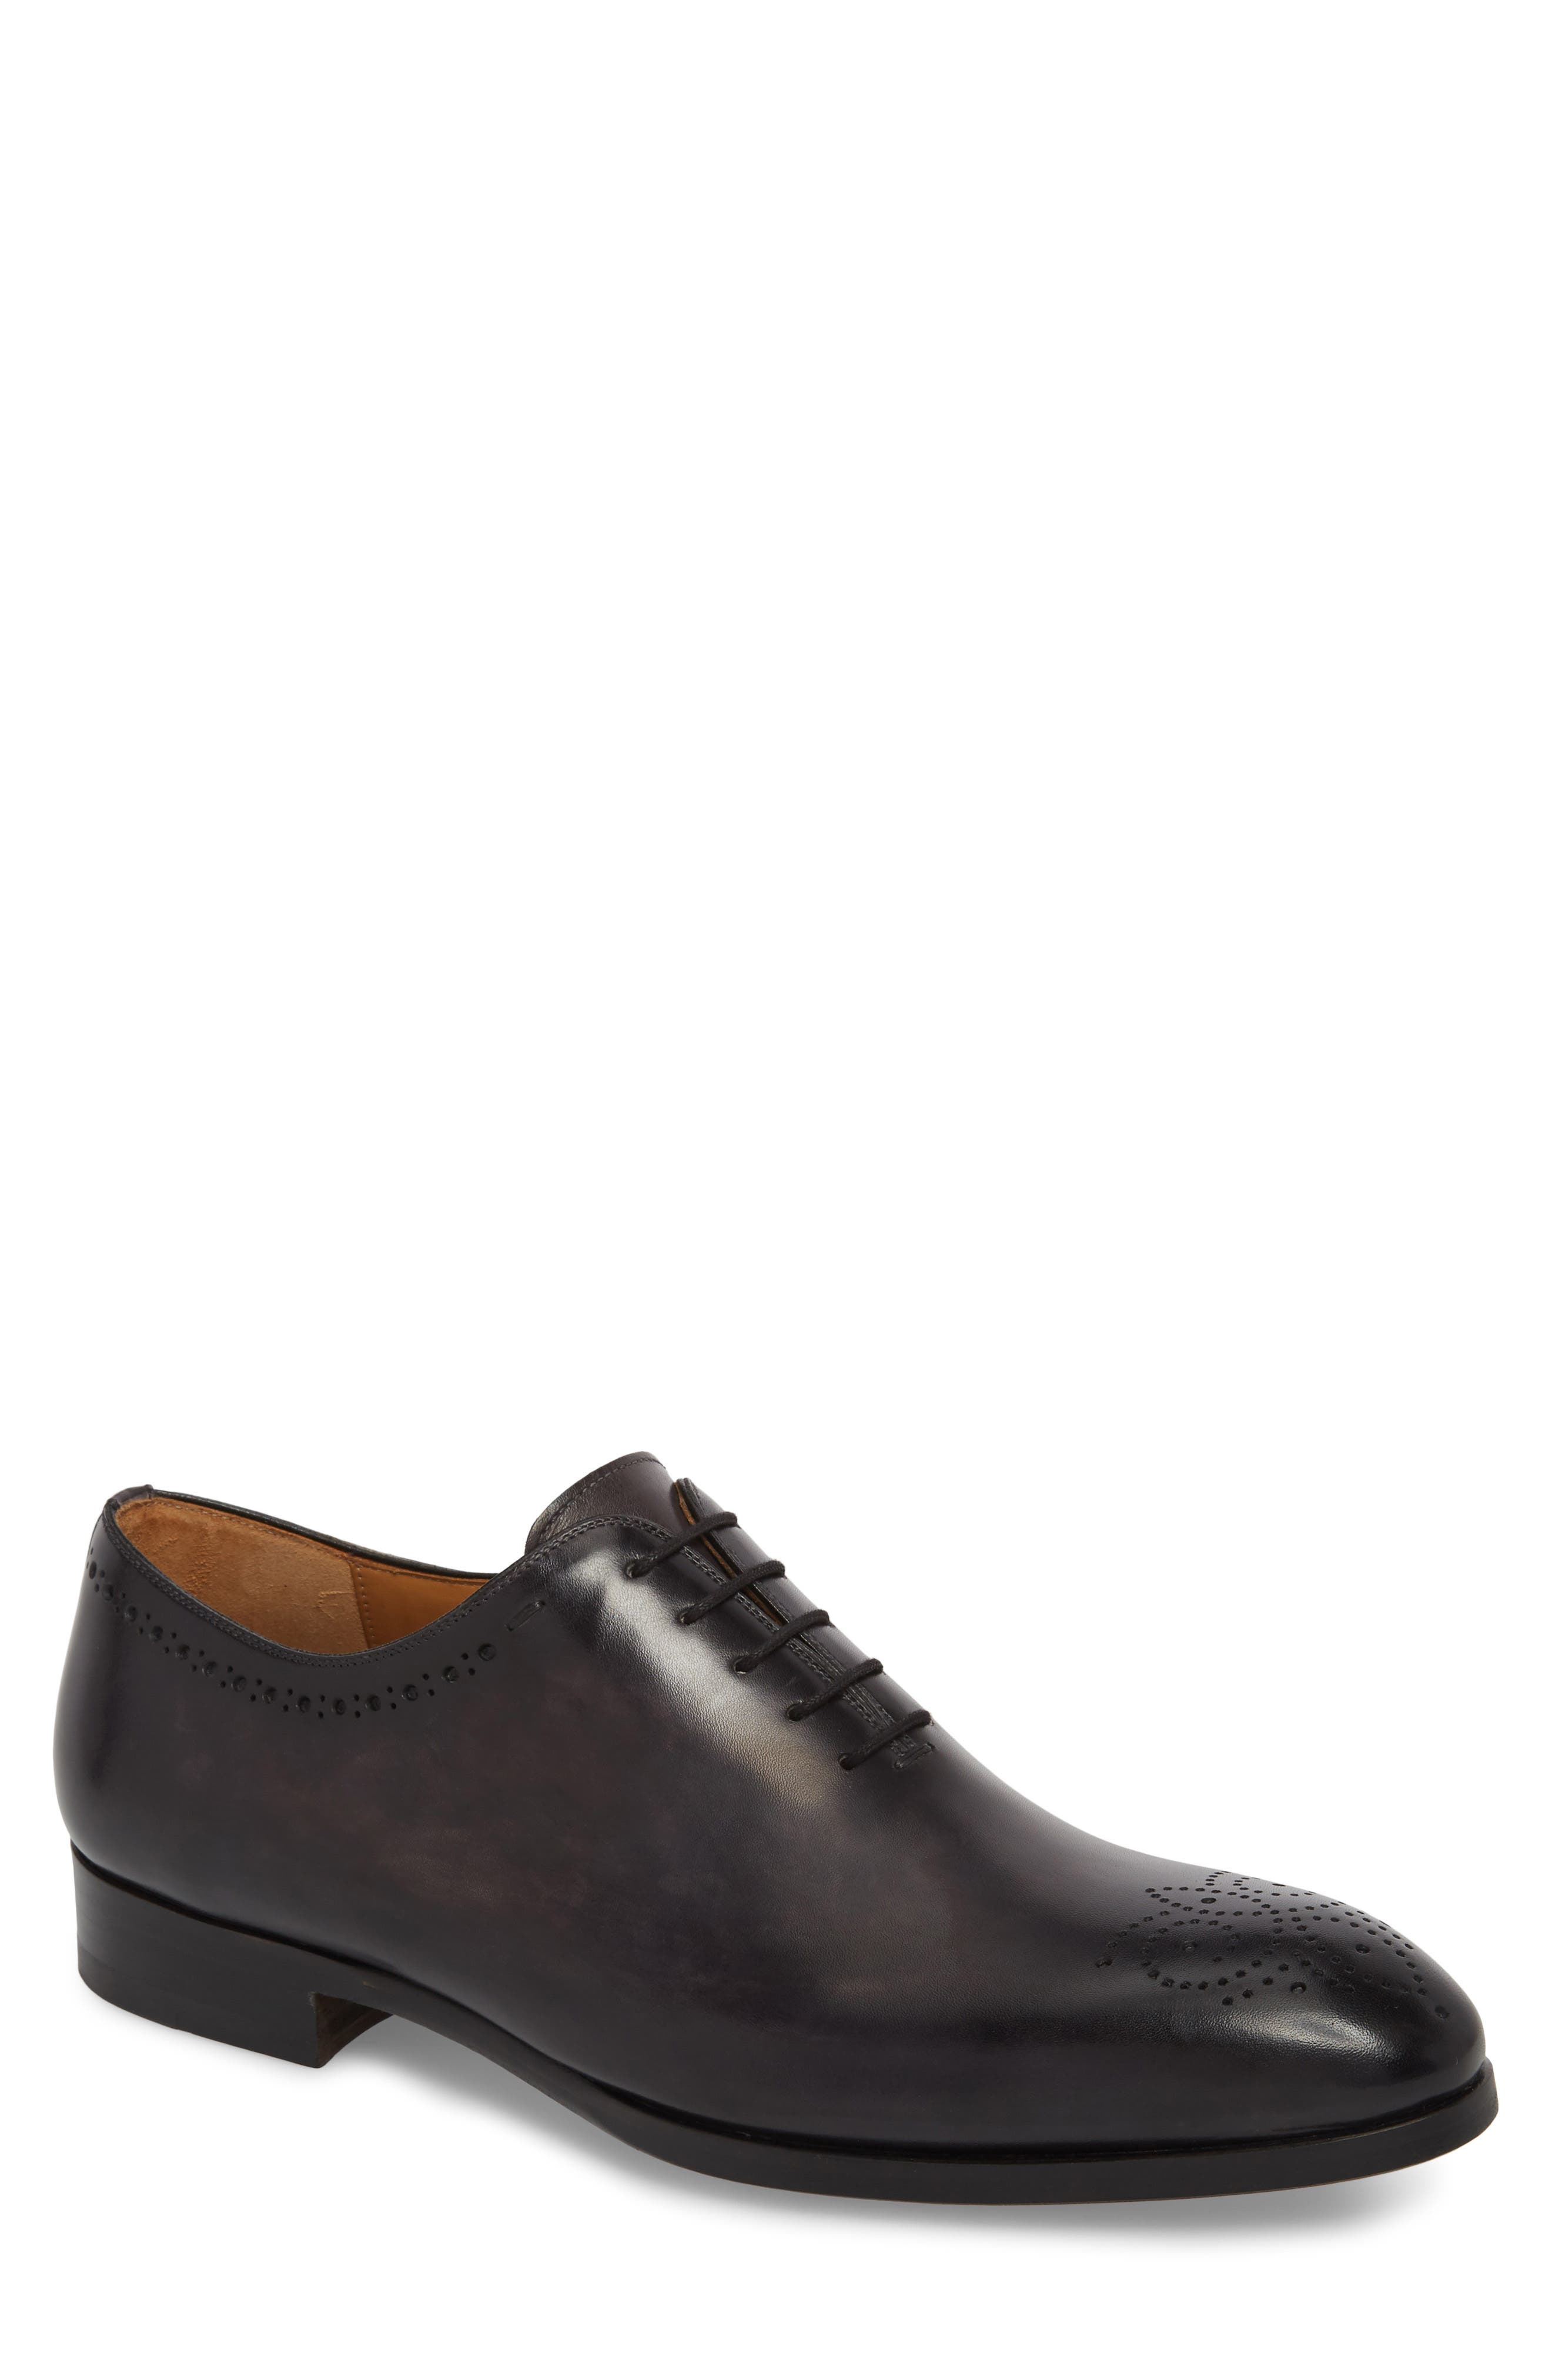 Paolo Brogued Whole Cut Shoe,                             Main thumbnail 1, color,                             020